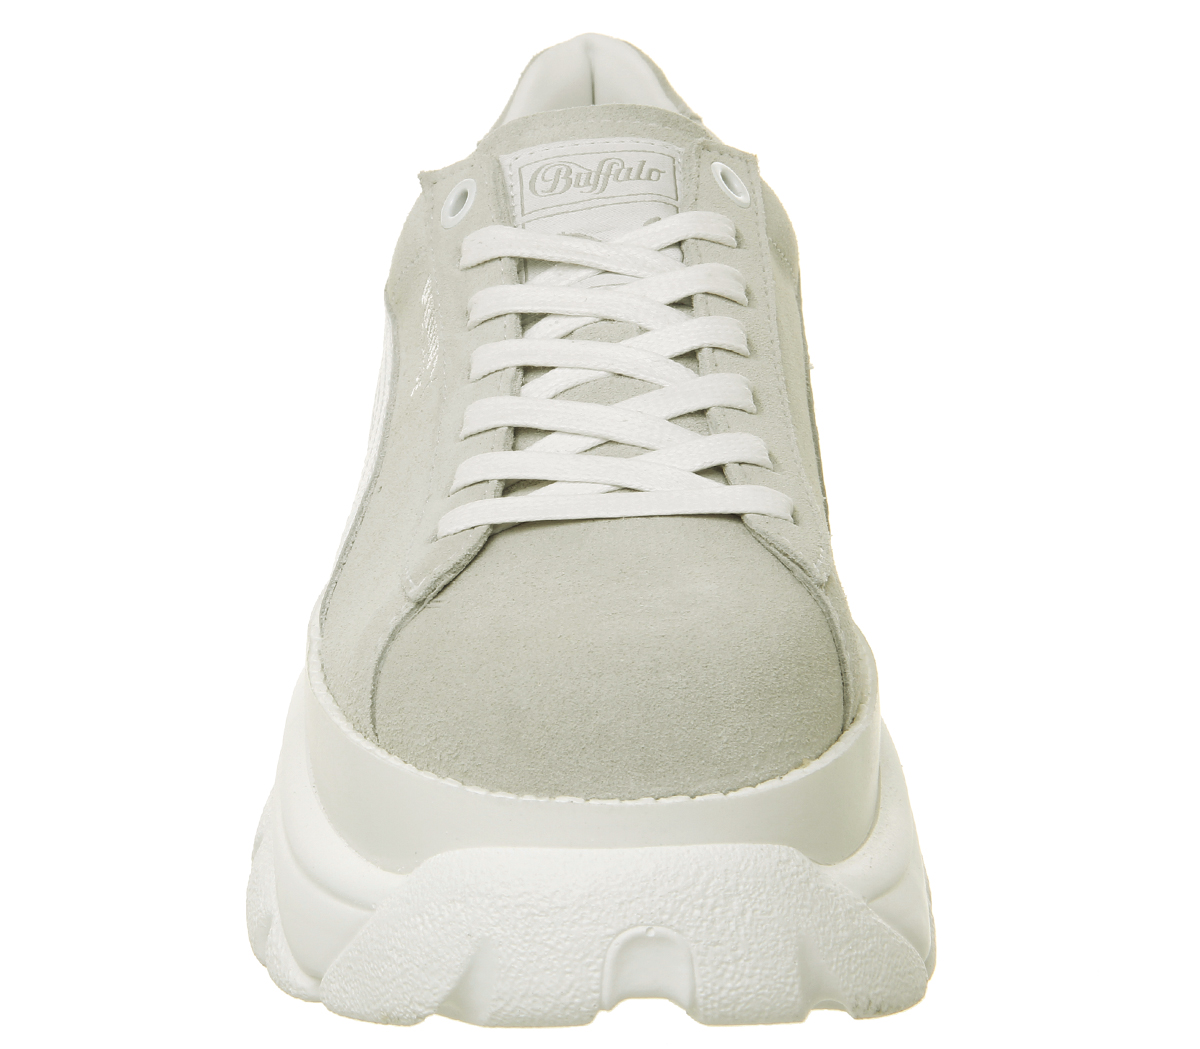 94ea3c739cf Sentinel Womens Puma Suede Buffalo Puma White Trainers Shoes